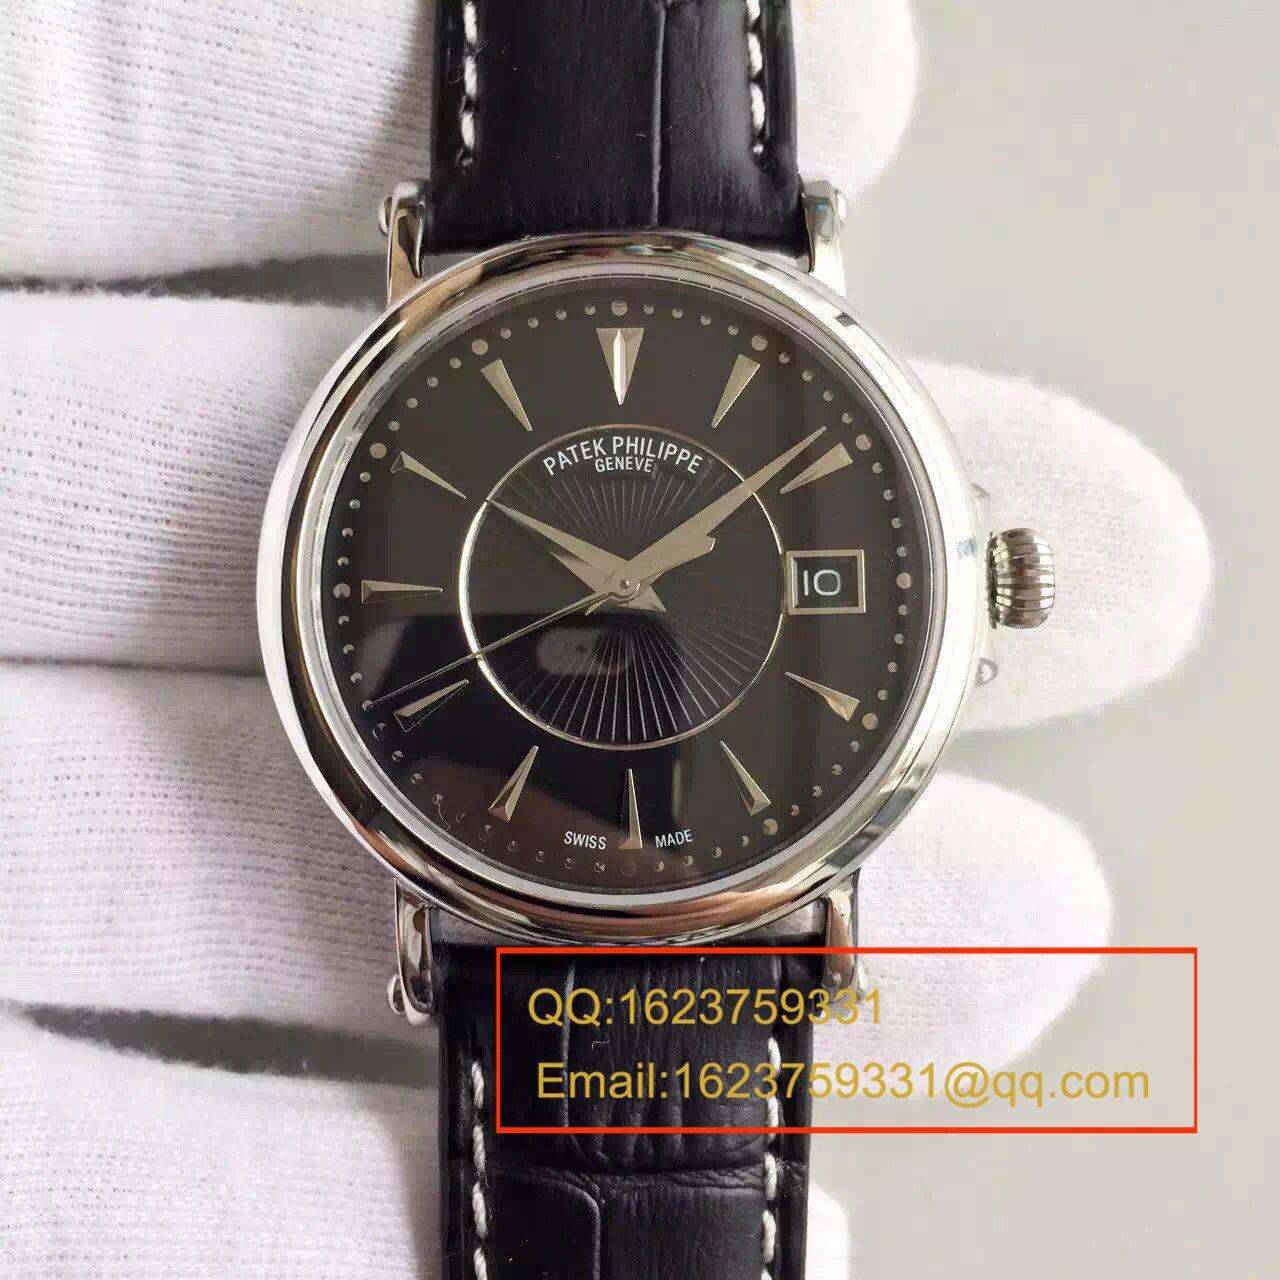 【HT一比一超A高仿手表】百达翡丽Calatrava 系列白金黑面男表5153G-001